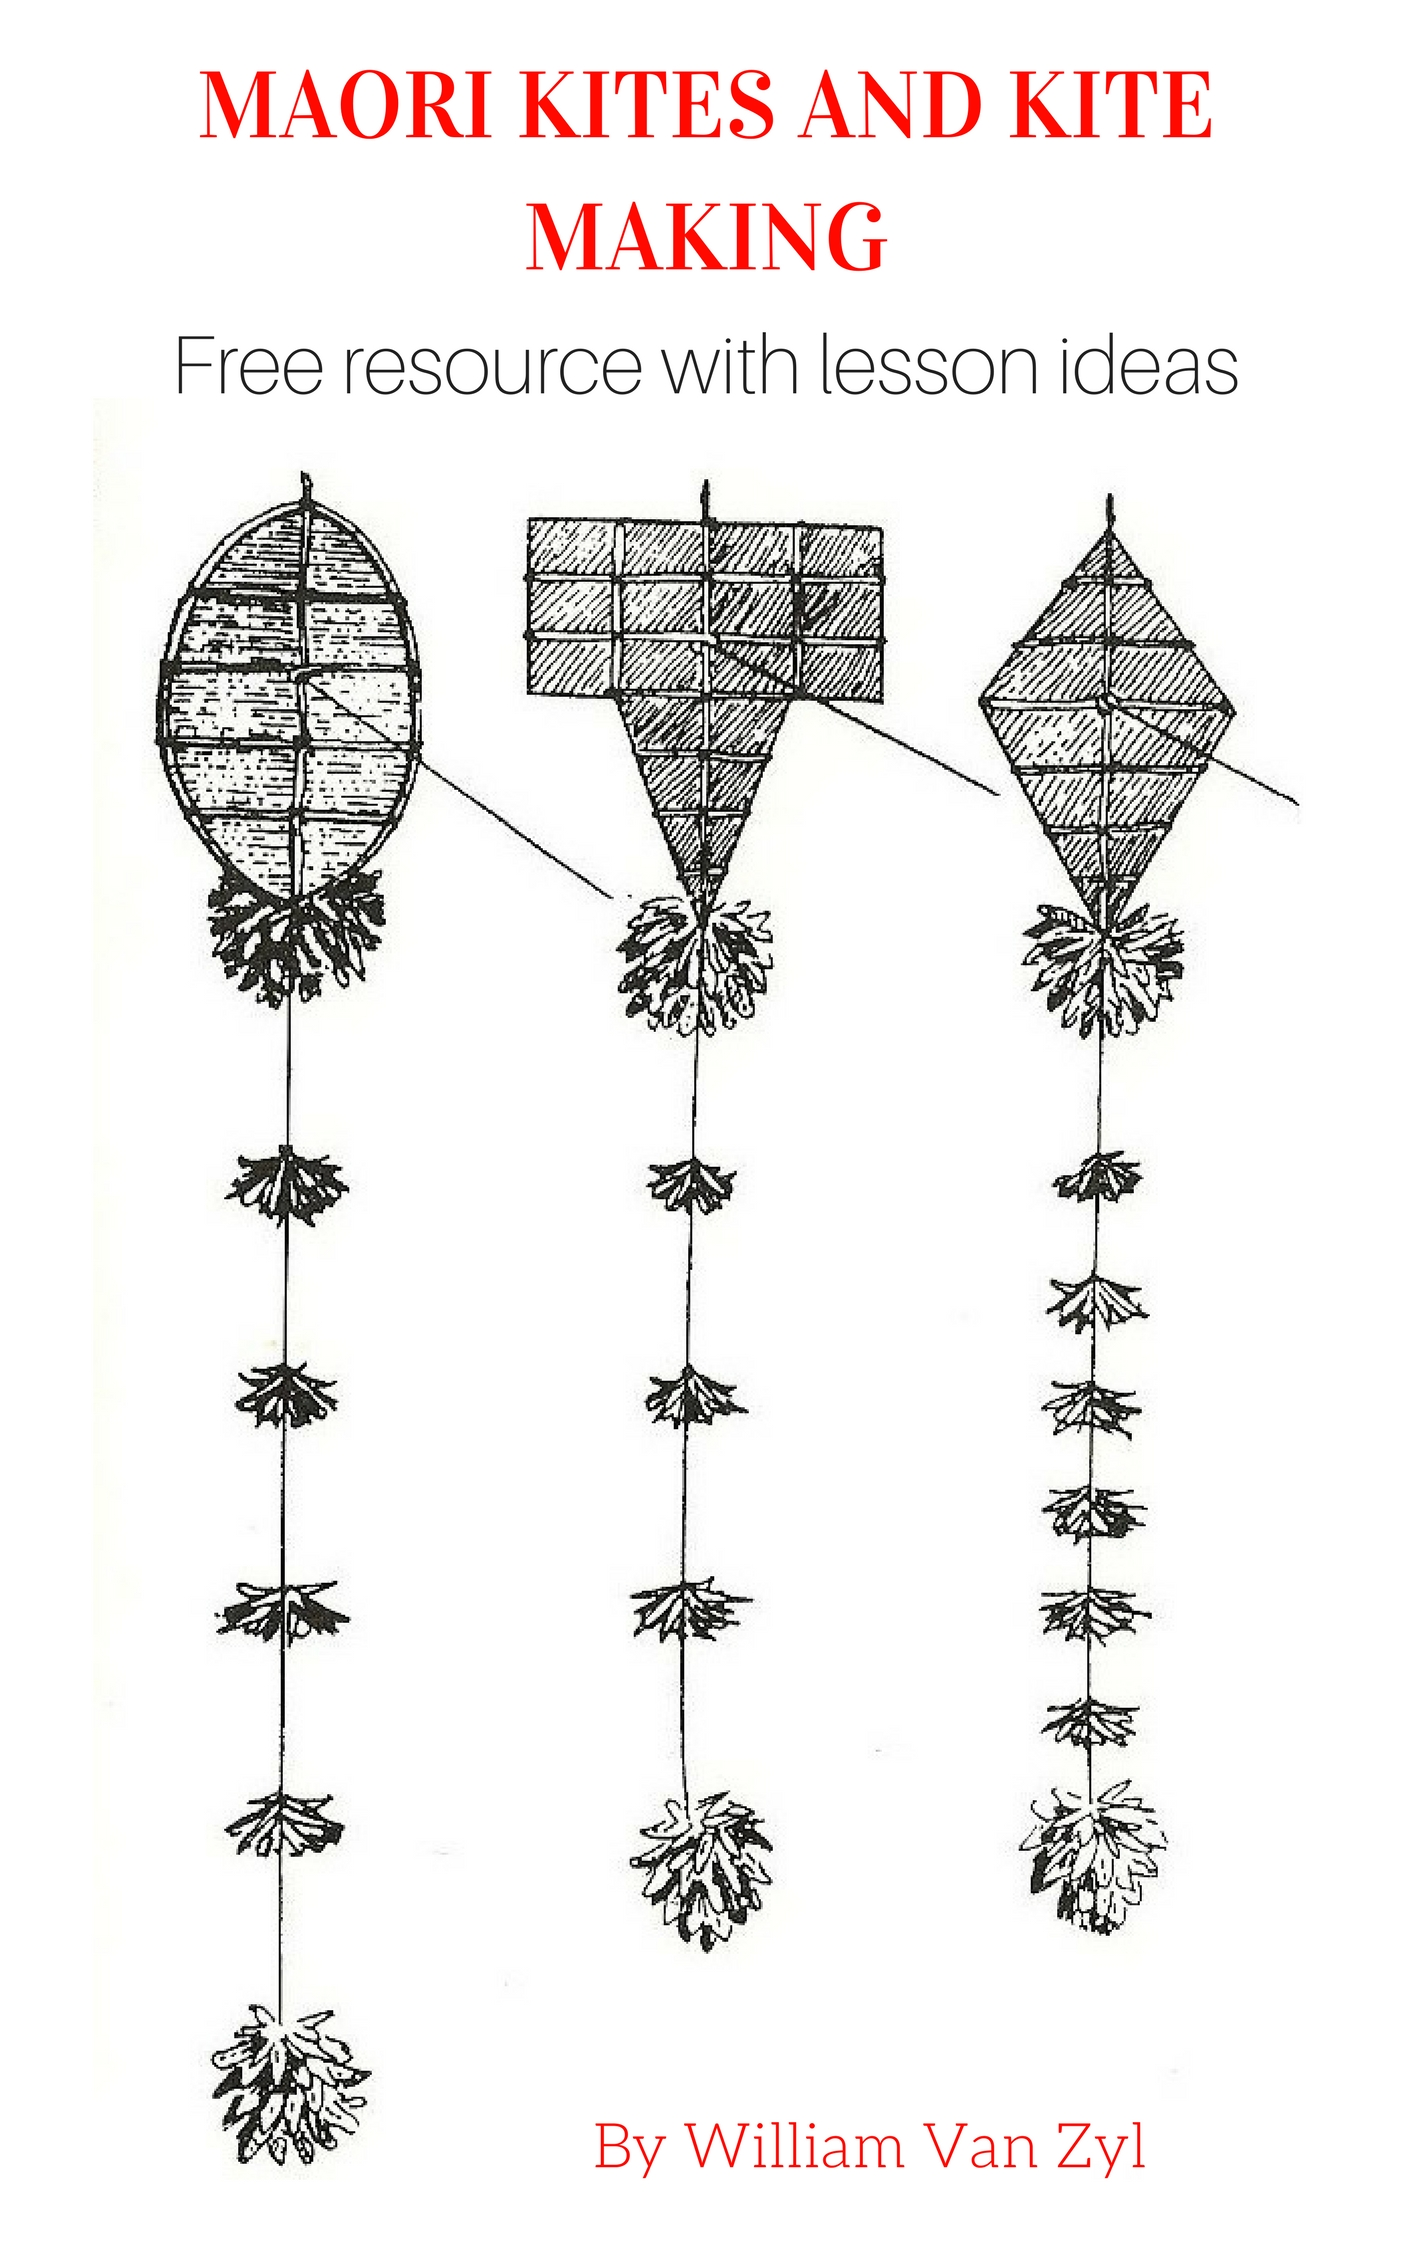 Maori kites and Kite Making. Free resources with lesson